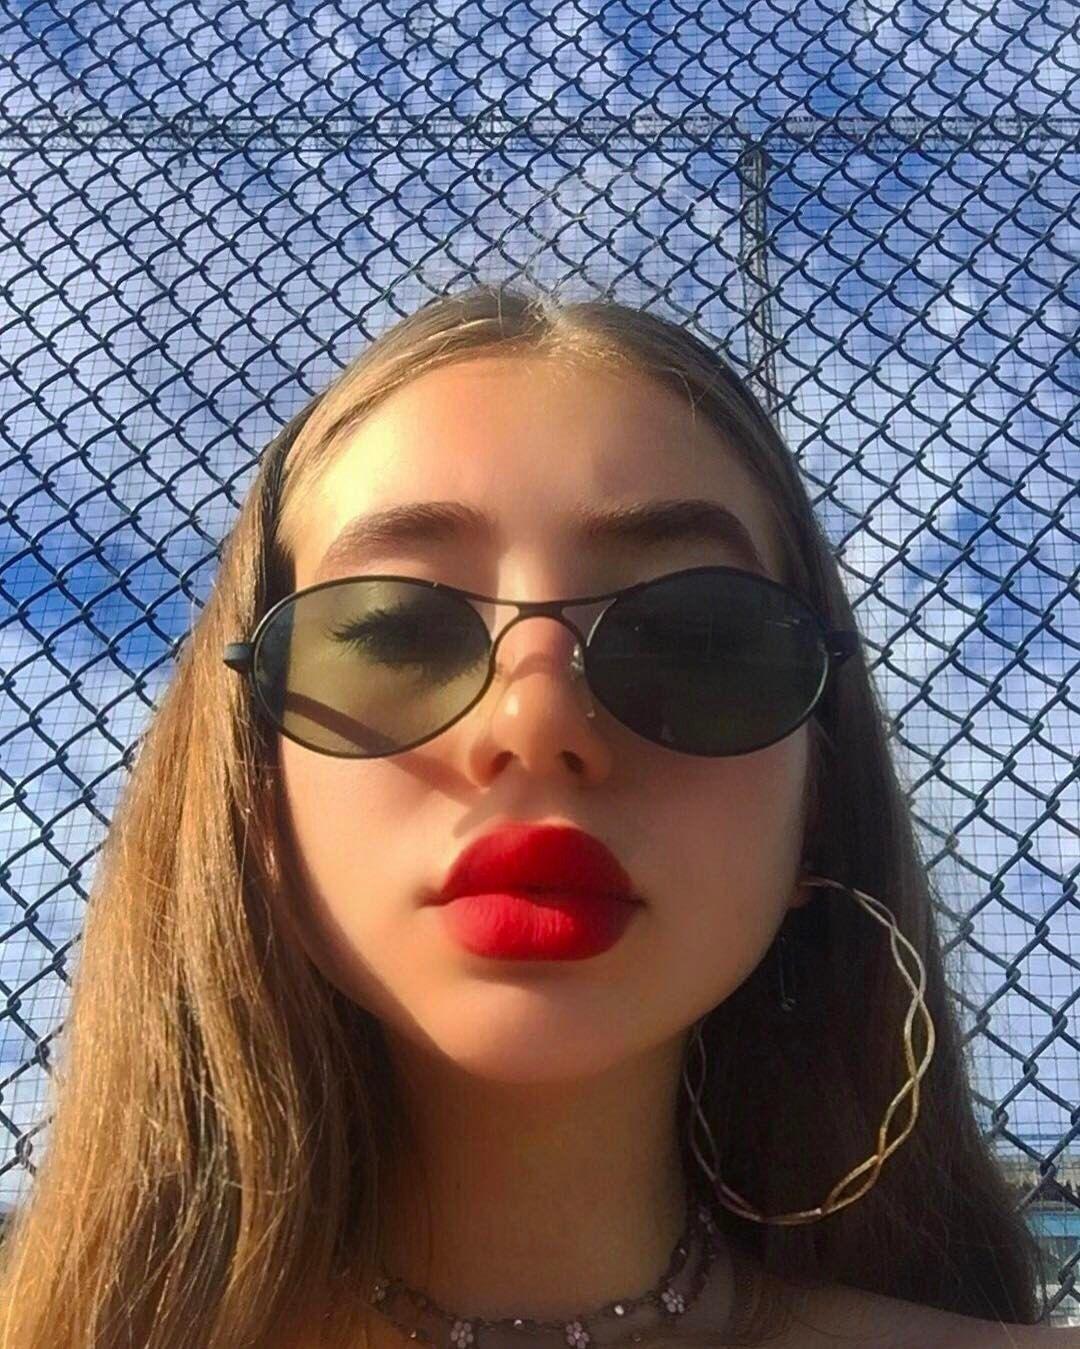 90s nose piercing  ˏˋ I s a b e l l a ˊˎ  Accessories  Pinterest  Ps